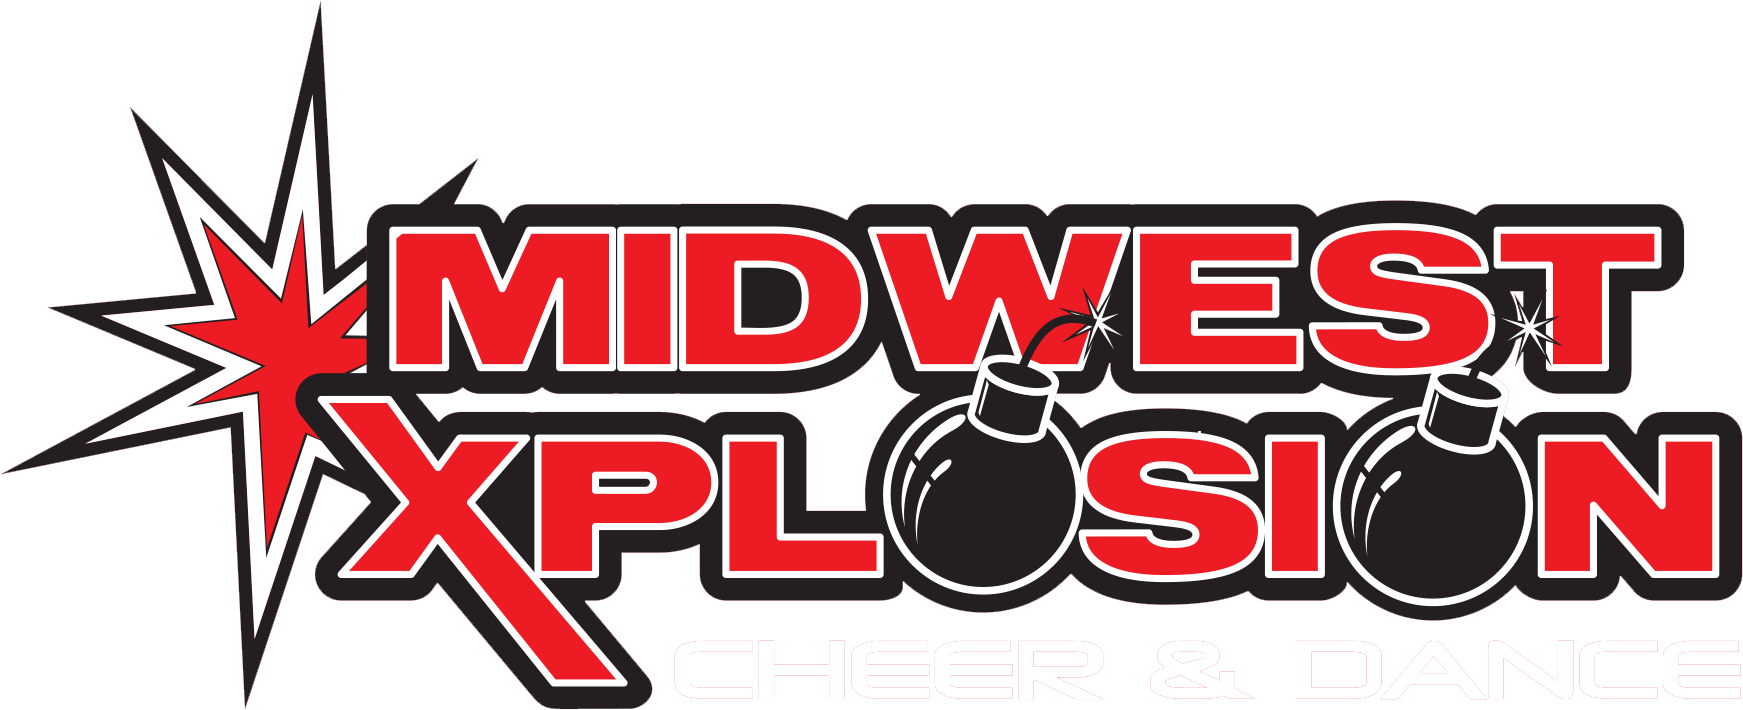 Midwest Xplosion